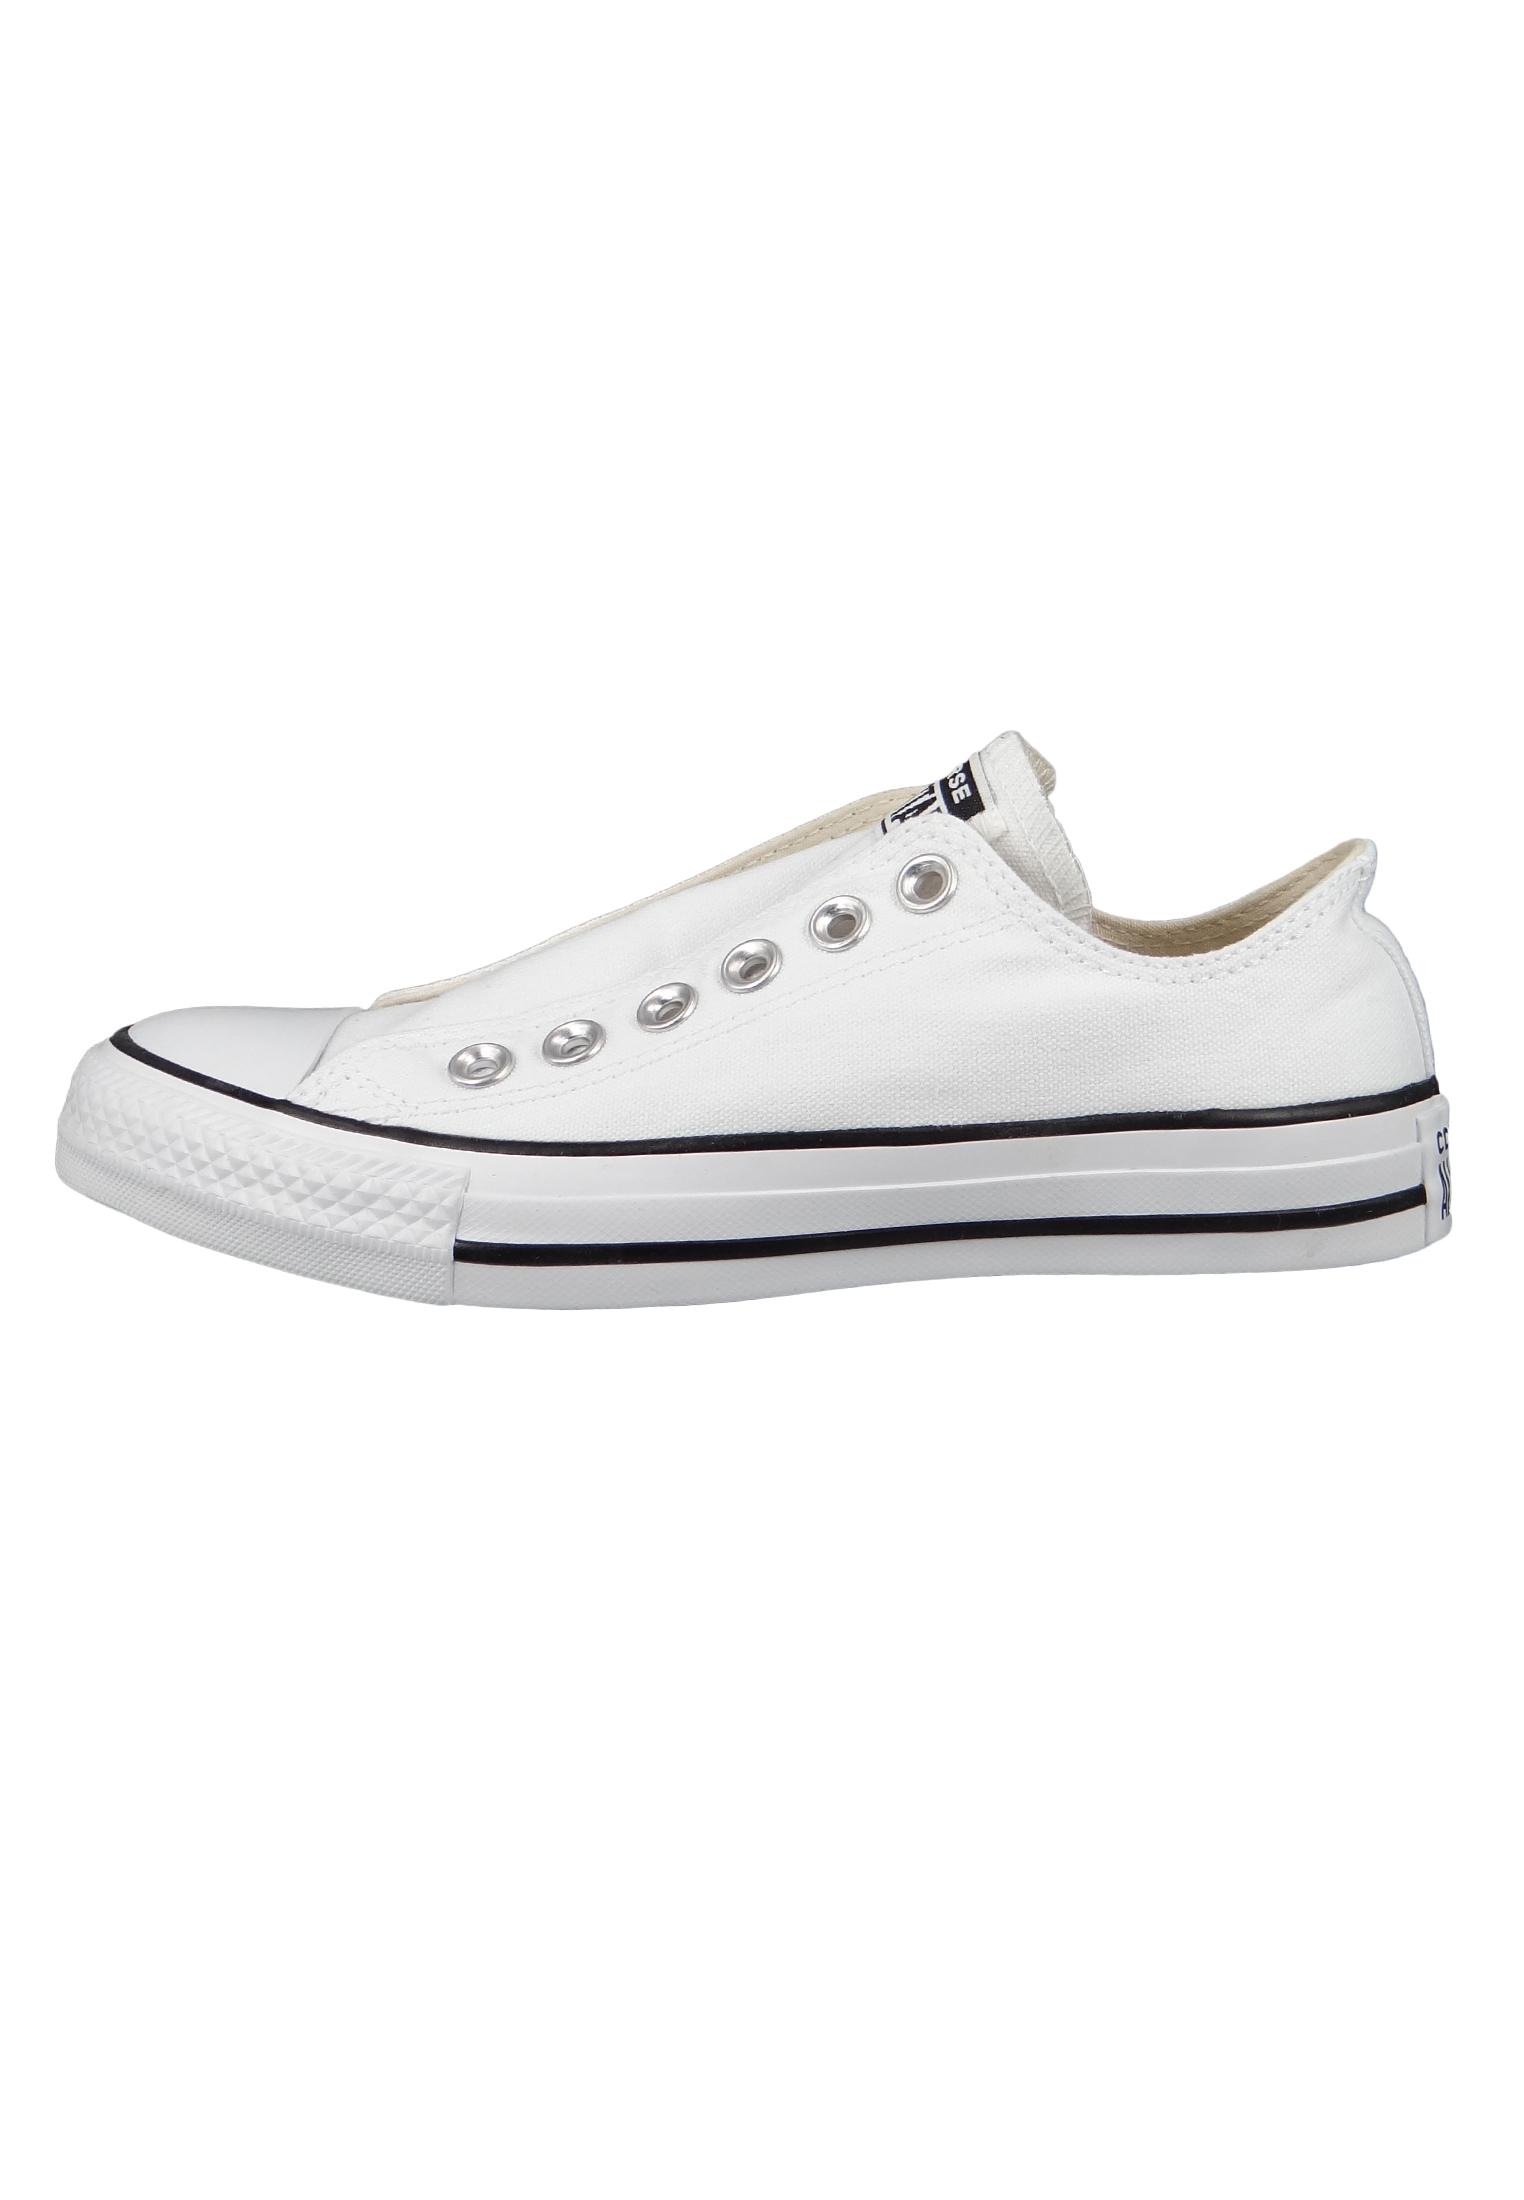 Converse Chucks Weiss164301C CT AS Slip ON White